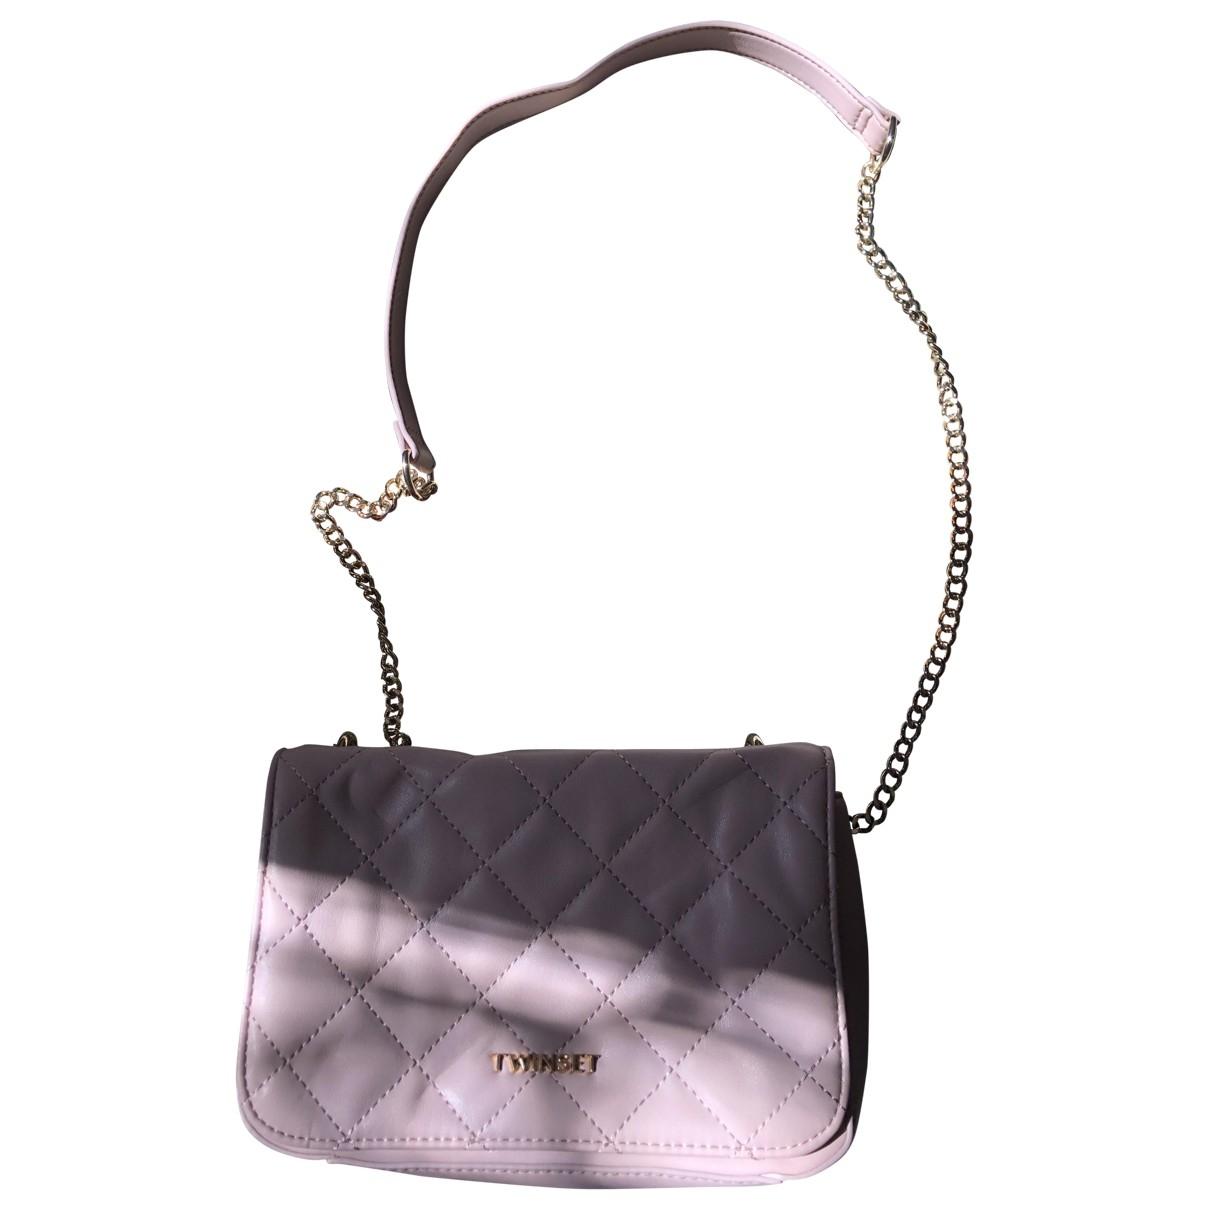 Twin Set \N Pink Patent leather handbag for Women \N